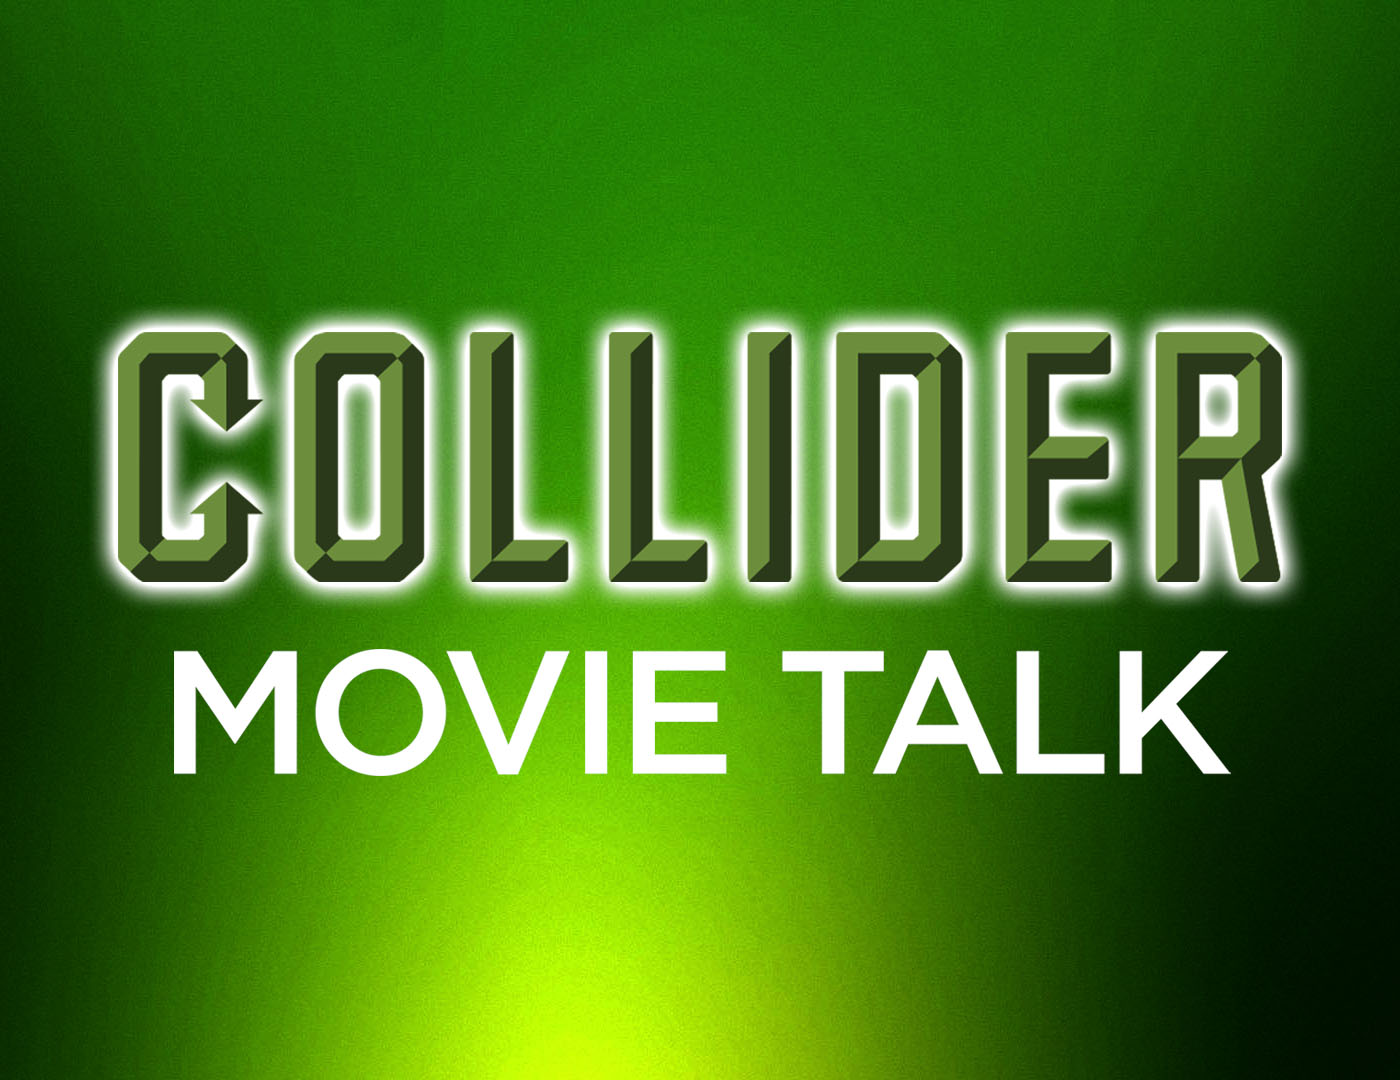 Han Solo Movie Crews Up - Collider Movie Talk